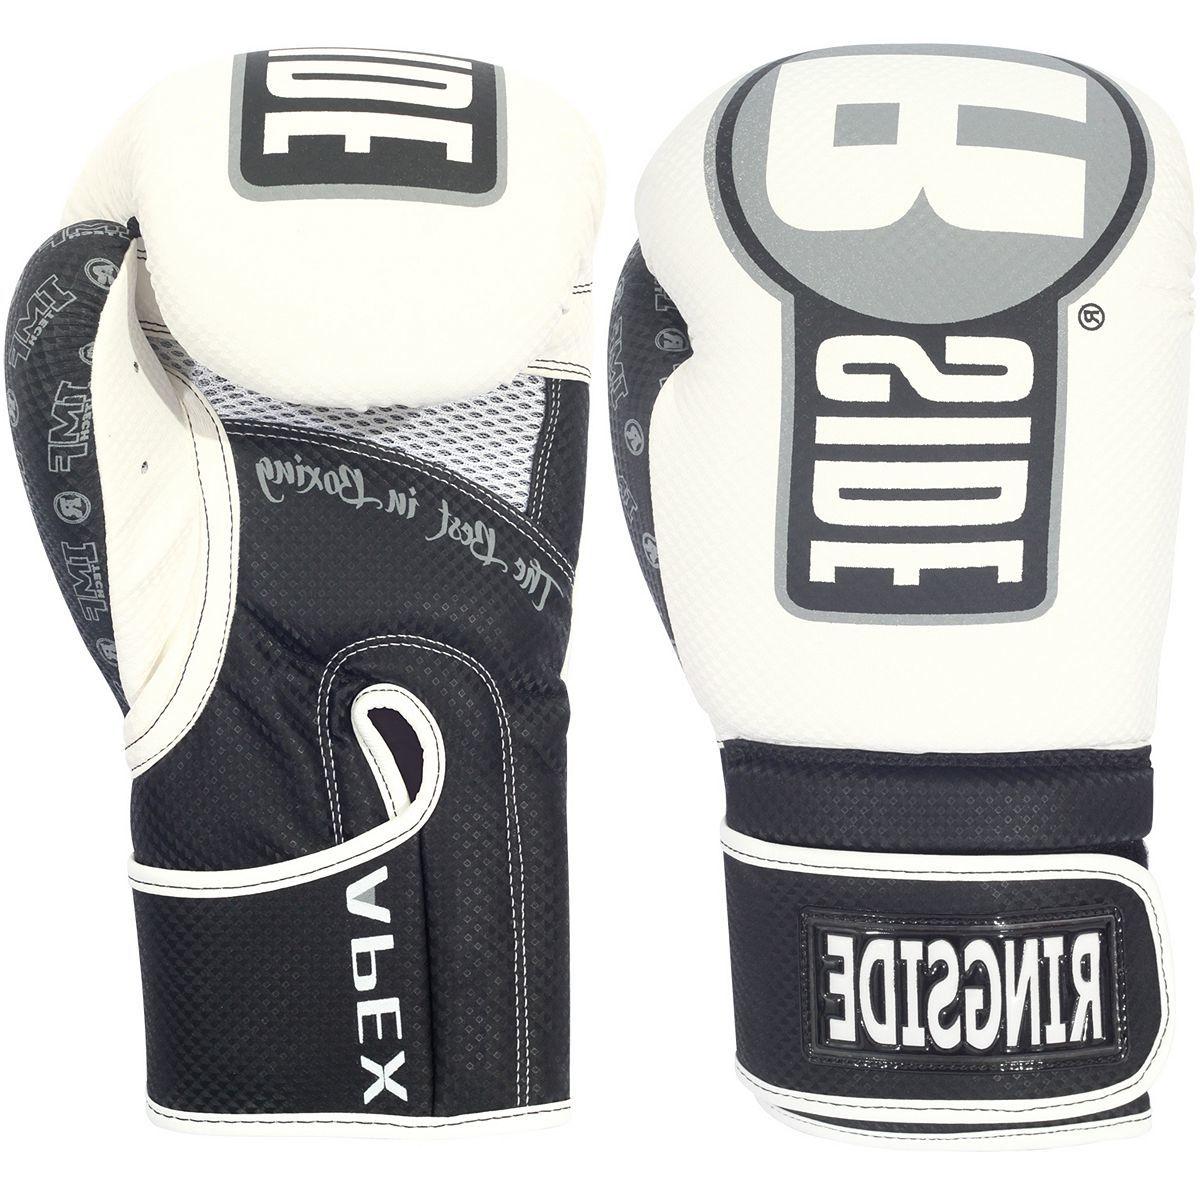 Ringside Apex Bag Boxing Gloves